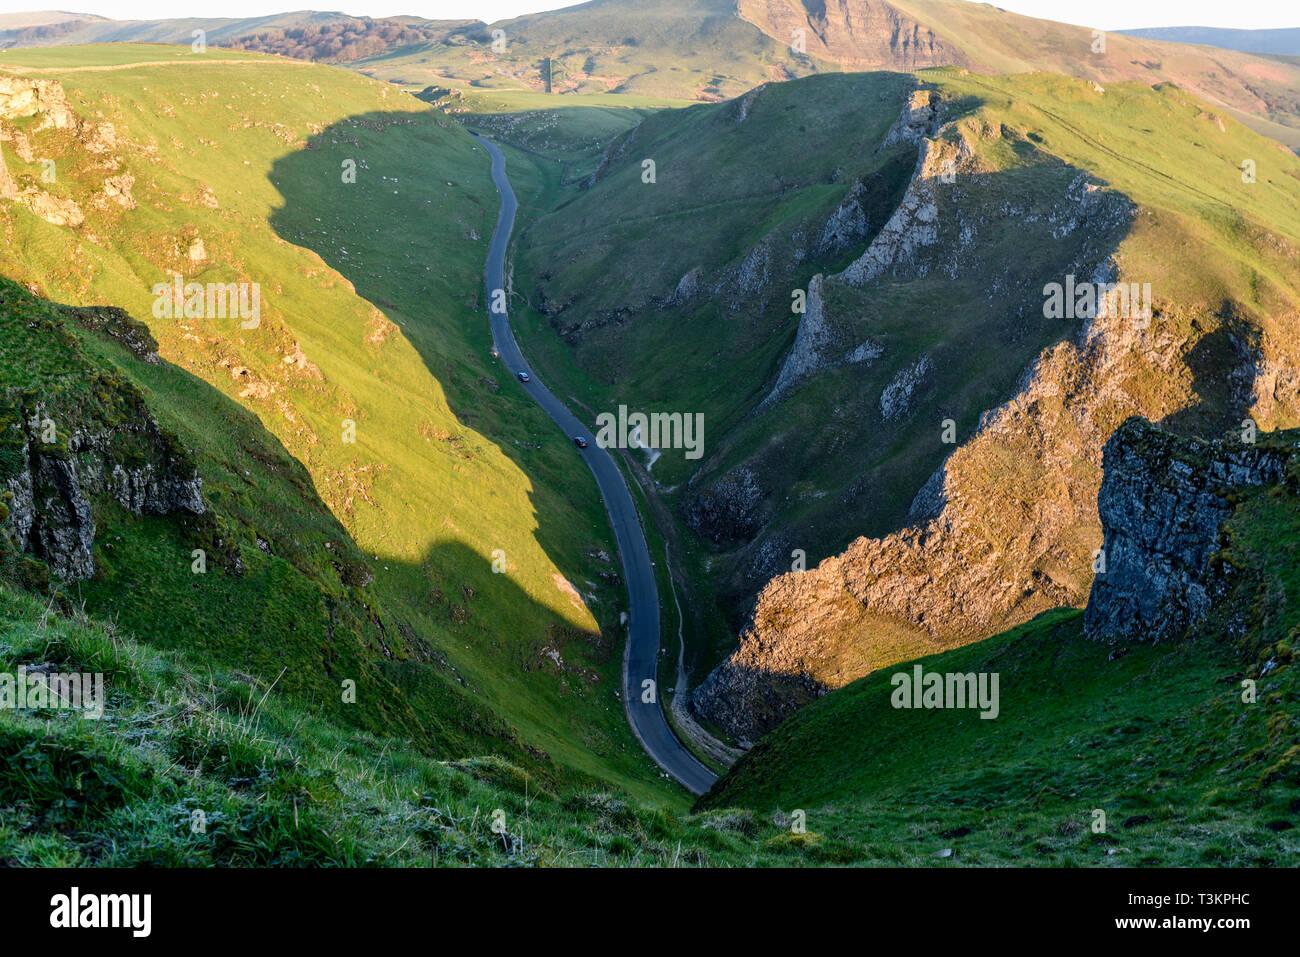 Winnats Pass Limestone Gorge in the High Peak of Derbyshire,UK. - Stock Image